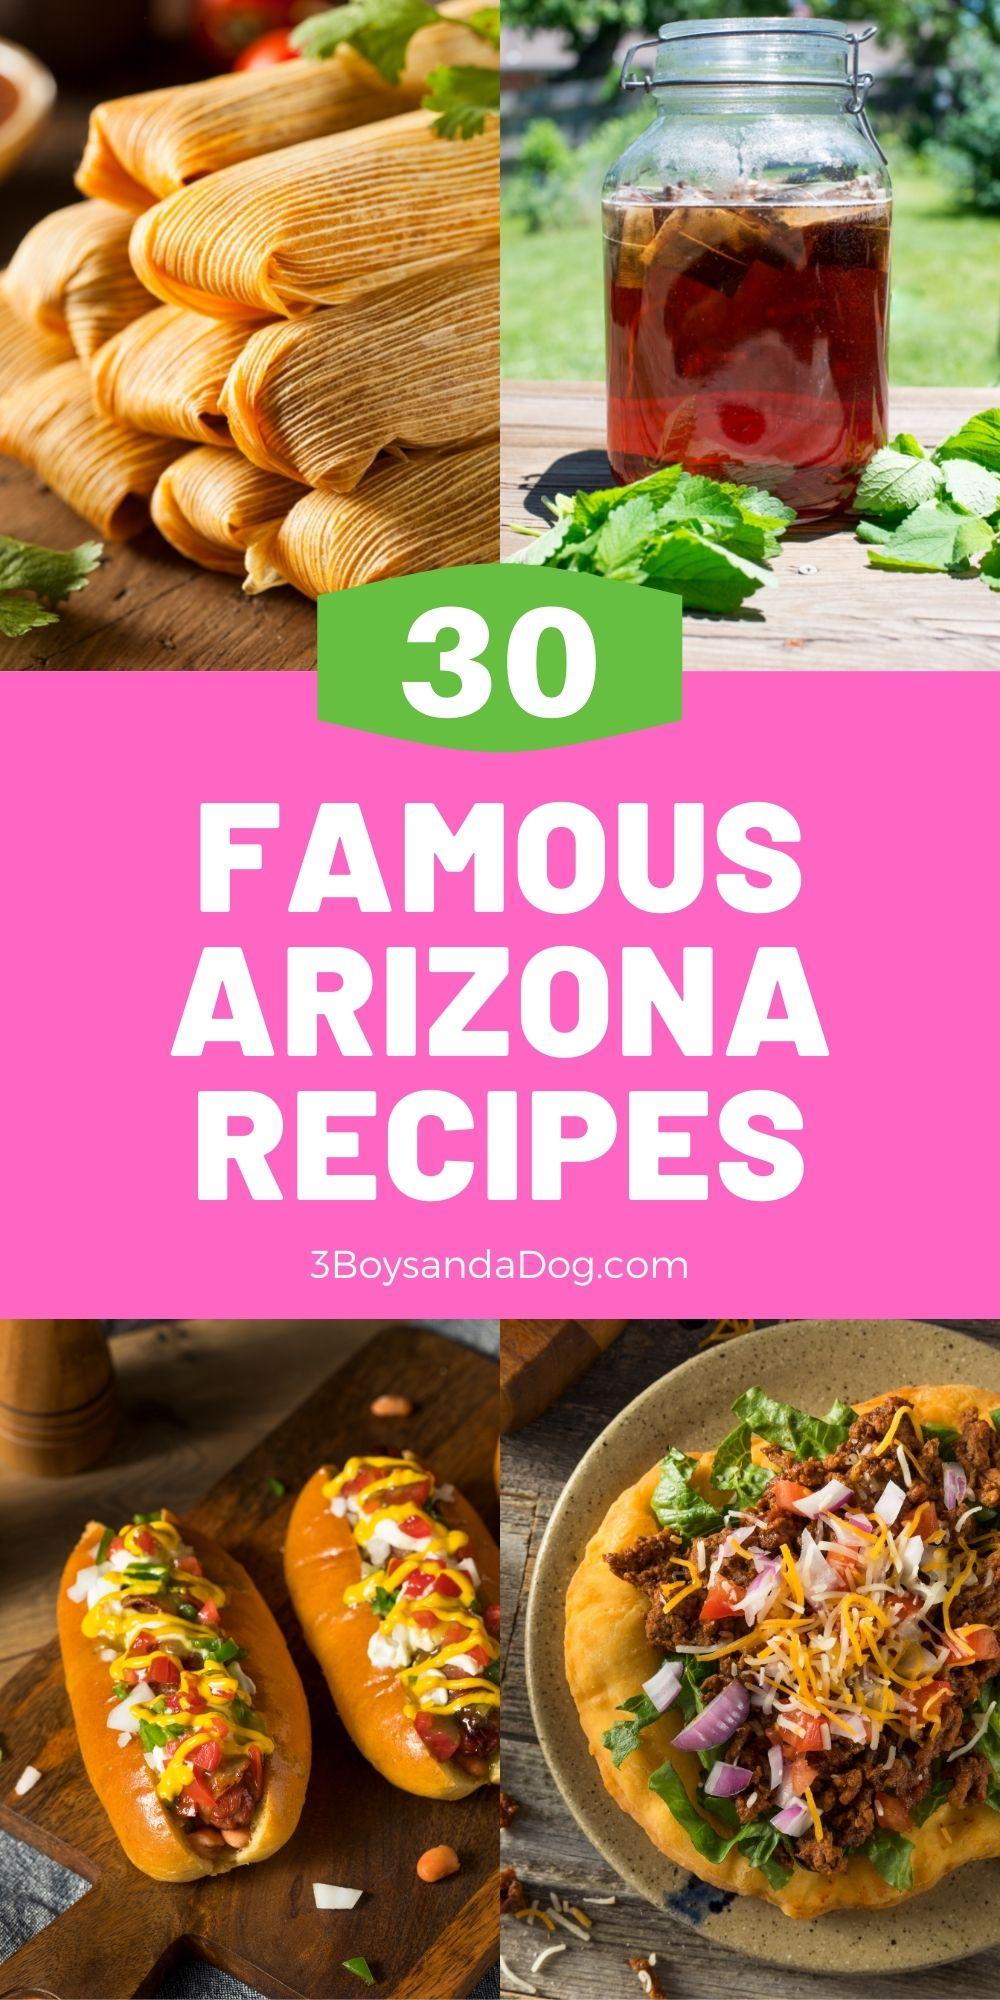 pin of famous Arizona foods